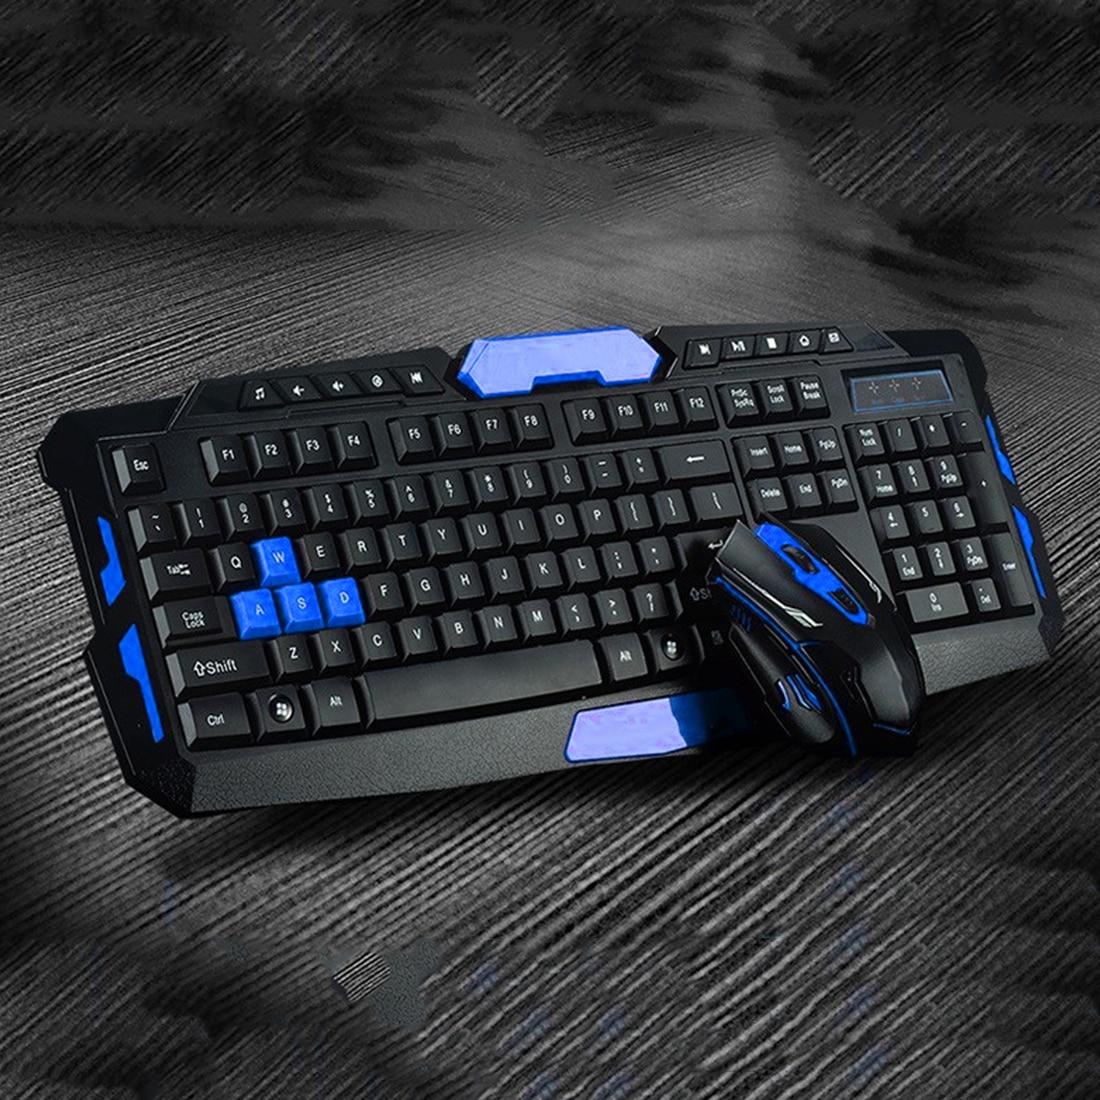 NOYOKERE 1600DPI Wireless Keyboard Mouse Set USB 2.4Ghz Gaming Gamer Mice Multimedia Waterproof for Computer PC desktop